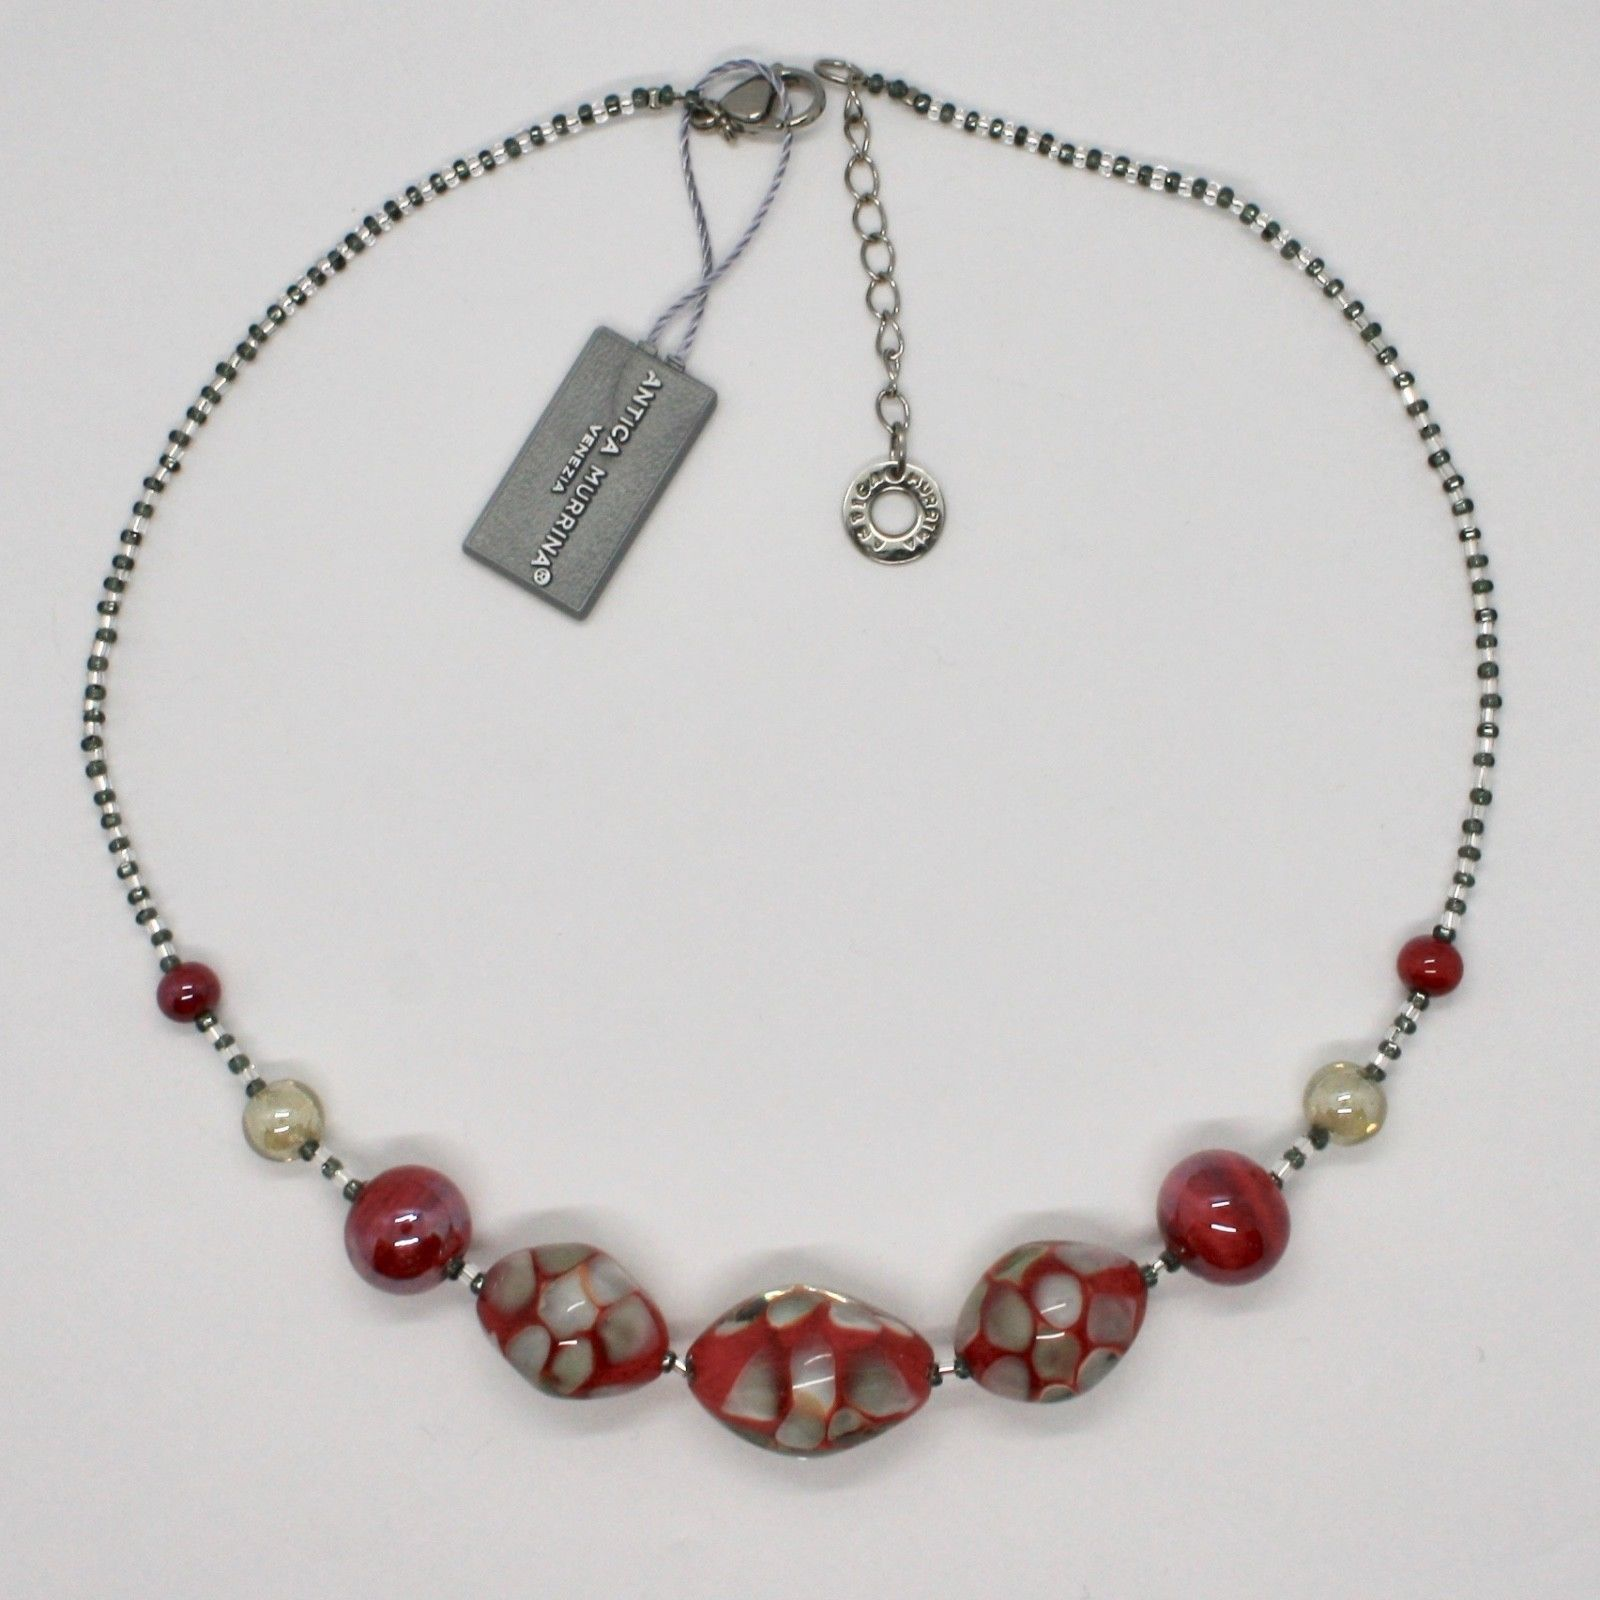 NECKLACE ANTICA MURRINA VENEZIA WITH MURANO GLASS WHITE GREY RED COA11A31